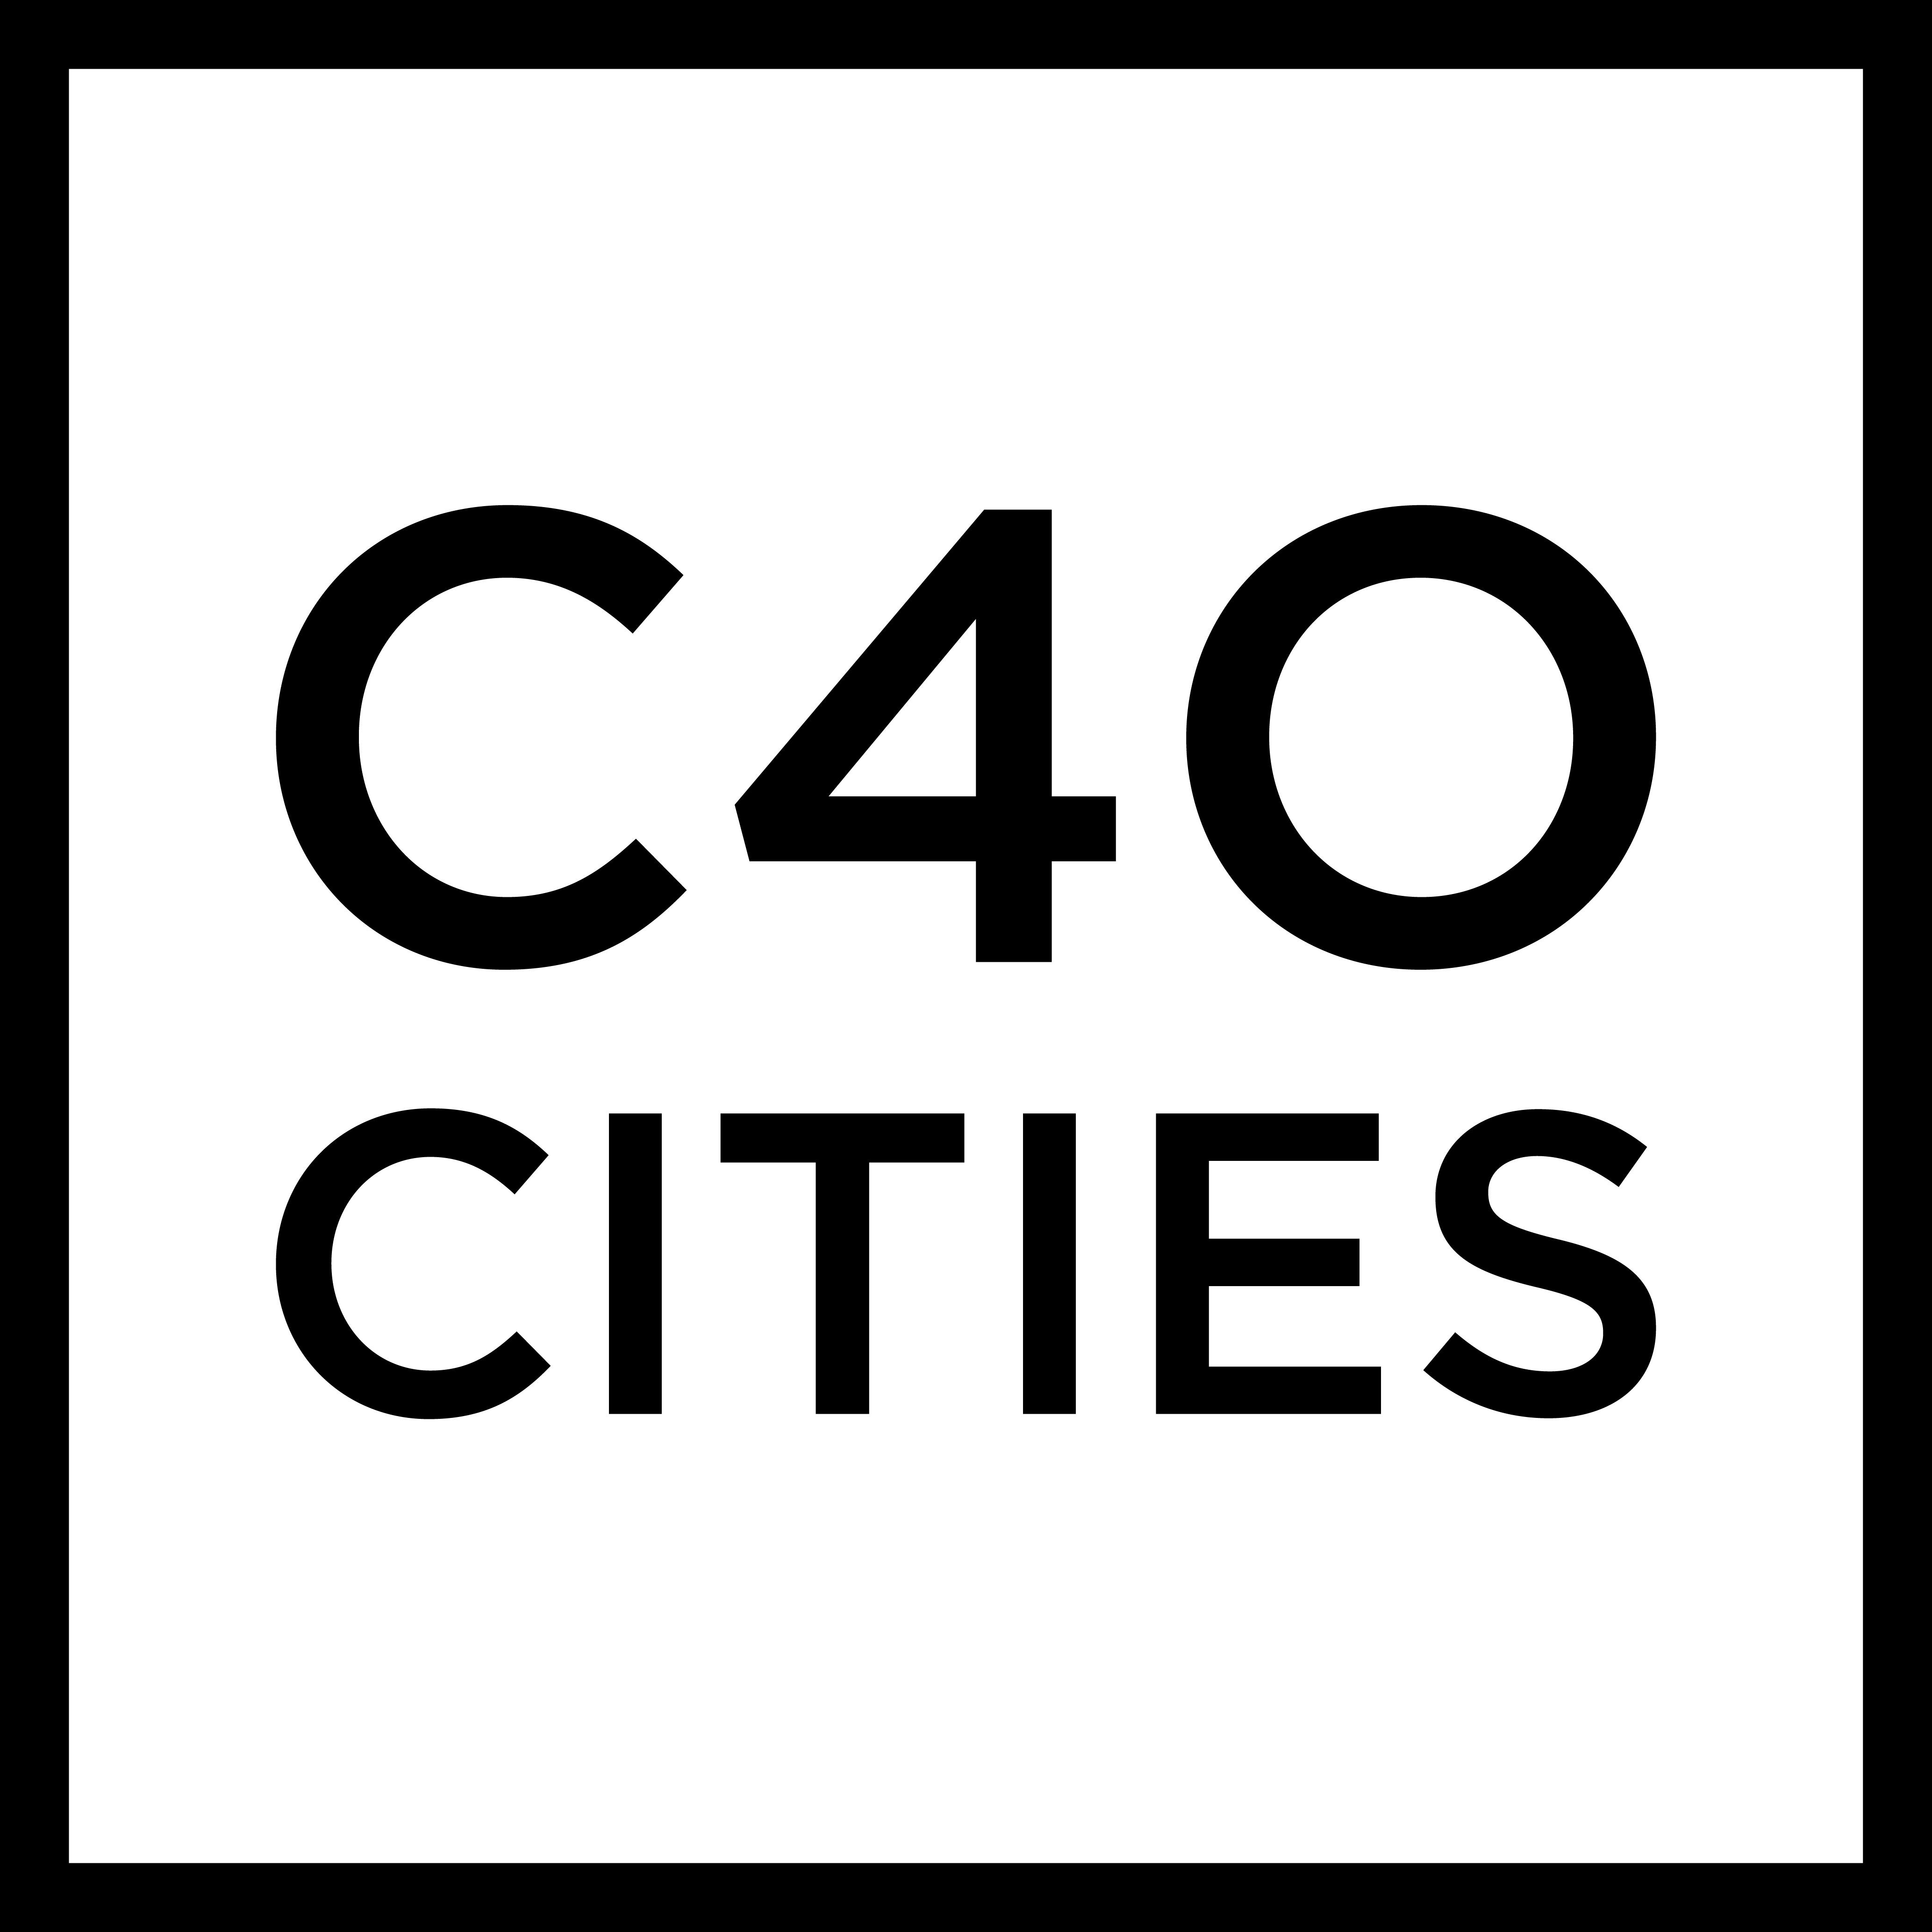 C40_LOGO_RVB_12_-_Ilan_Cuperstein_1